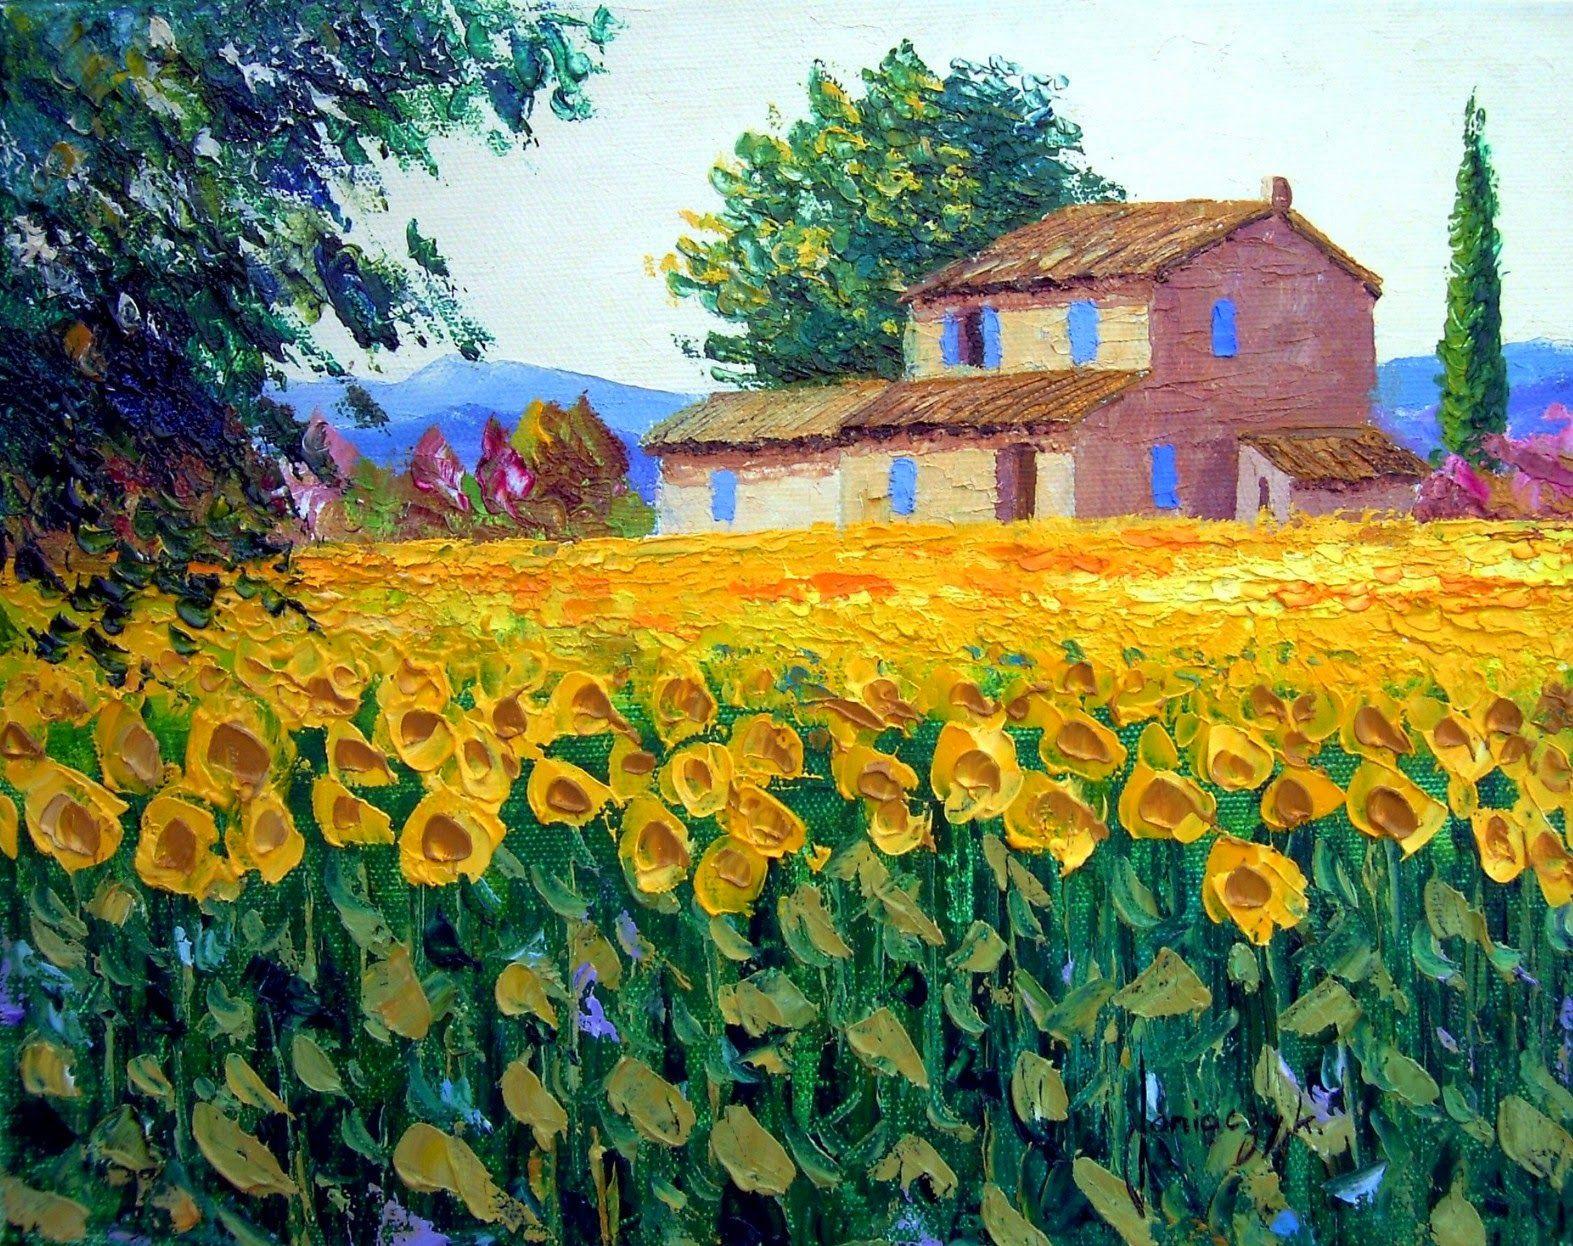 Flores En Paisajes Del Campo Pintadas Al Oleo Jean Marc Pintura Paisajistica Pinturas Hermosas Paisajes